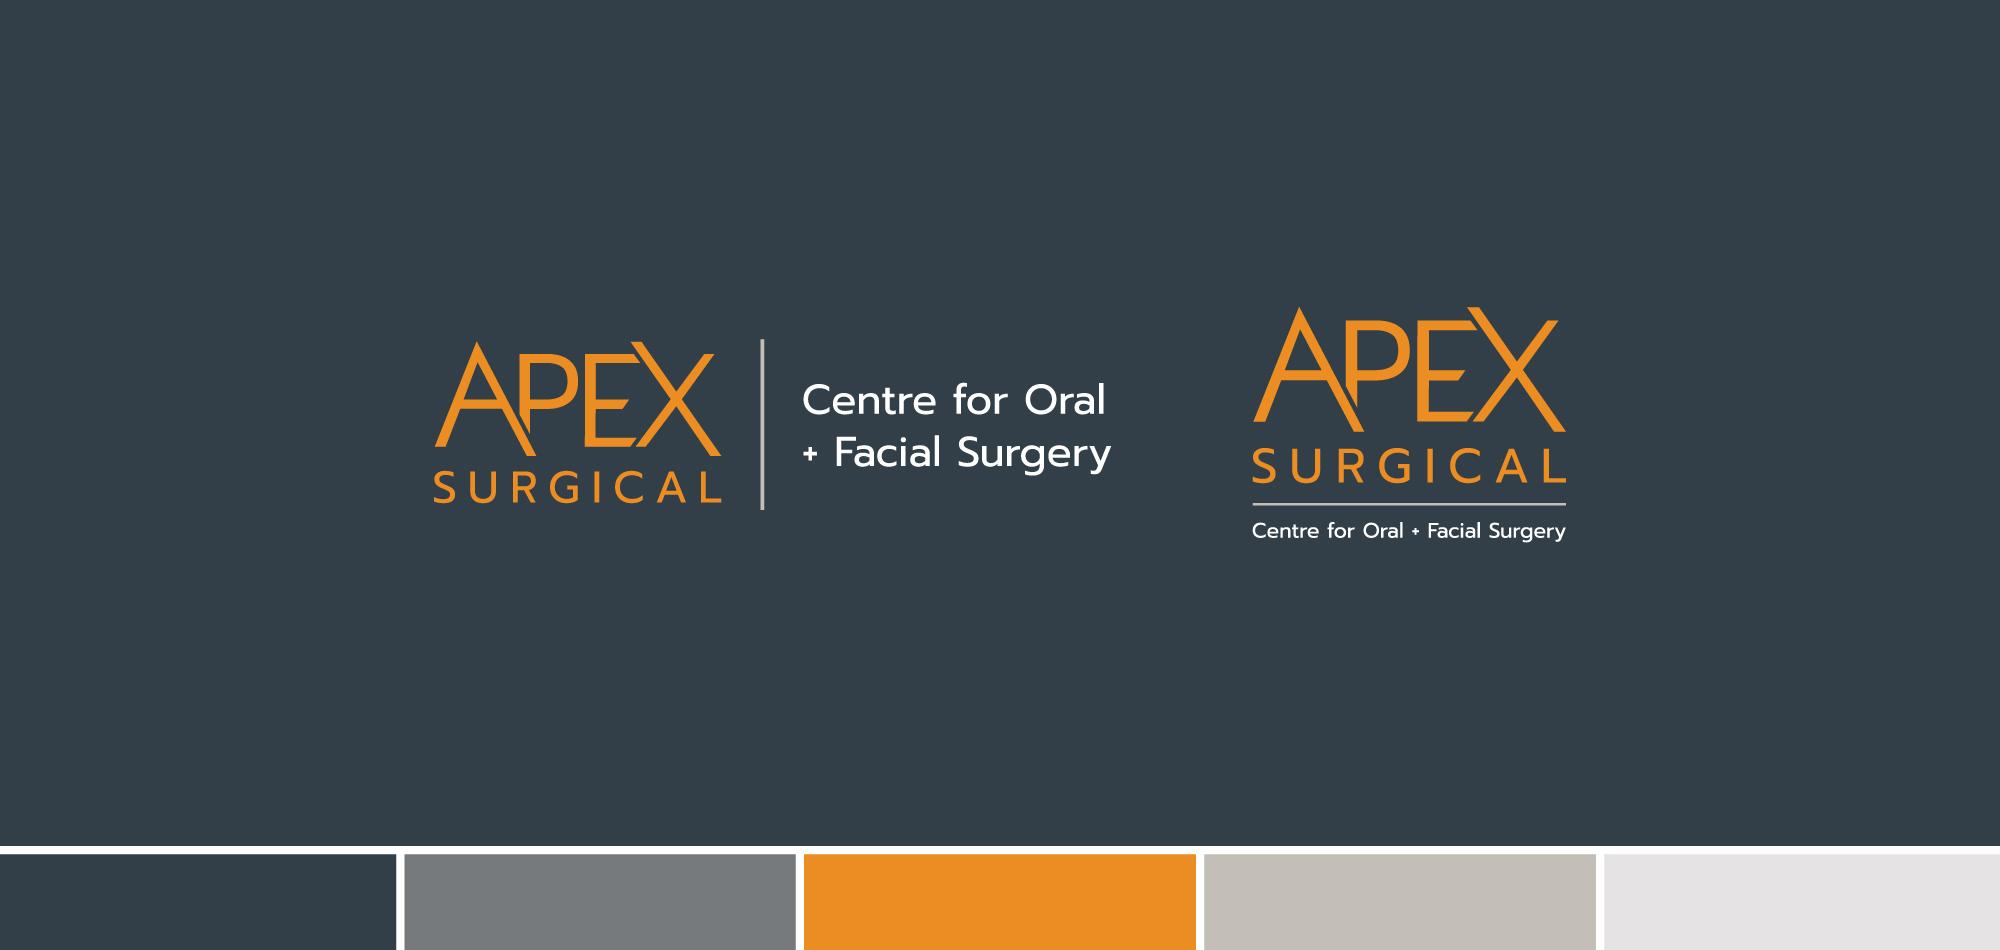 apexsurgical_logos_colours